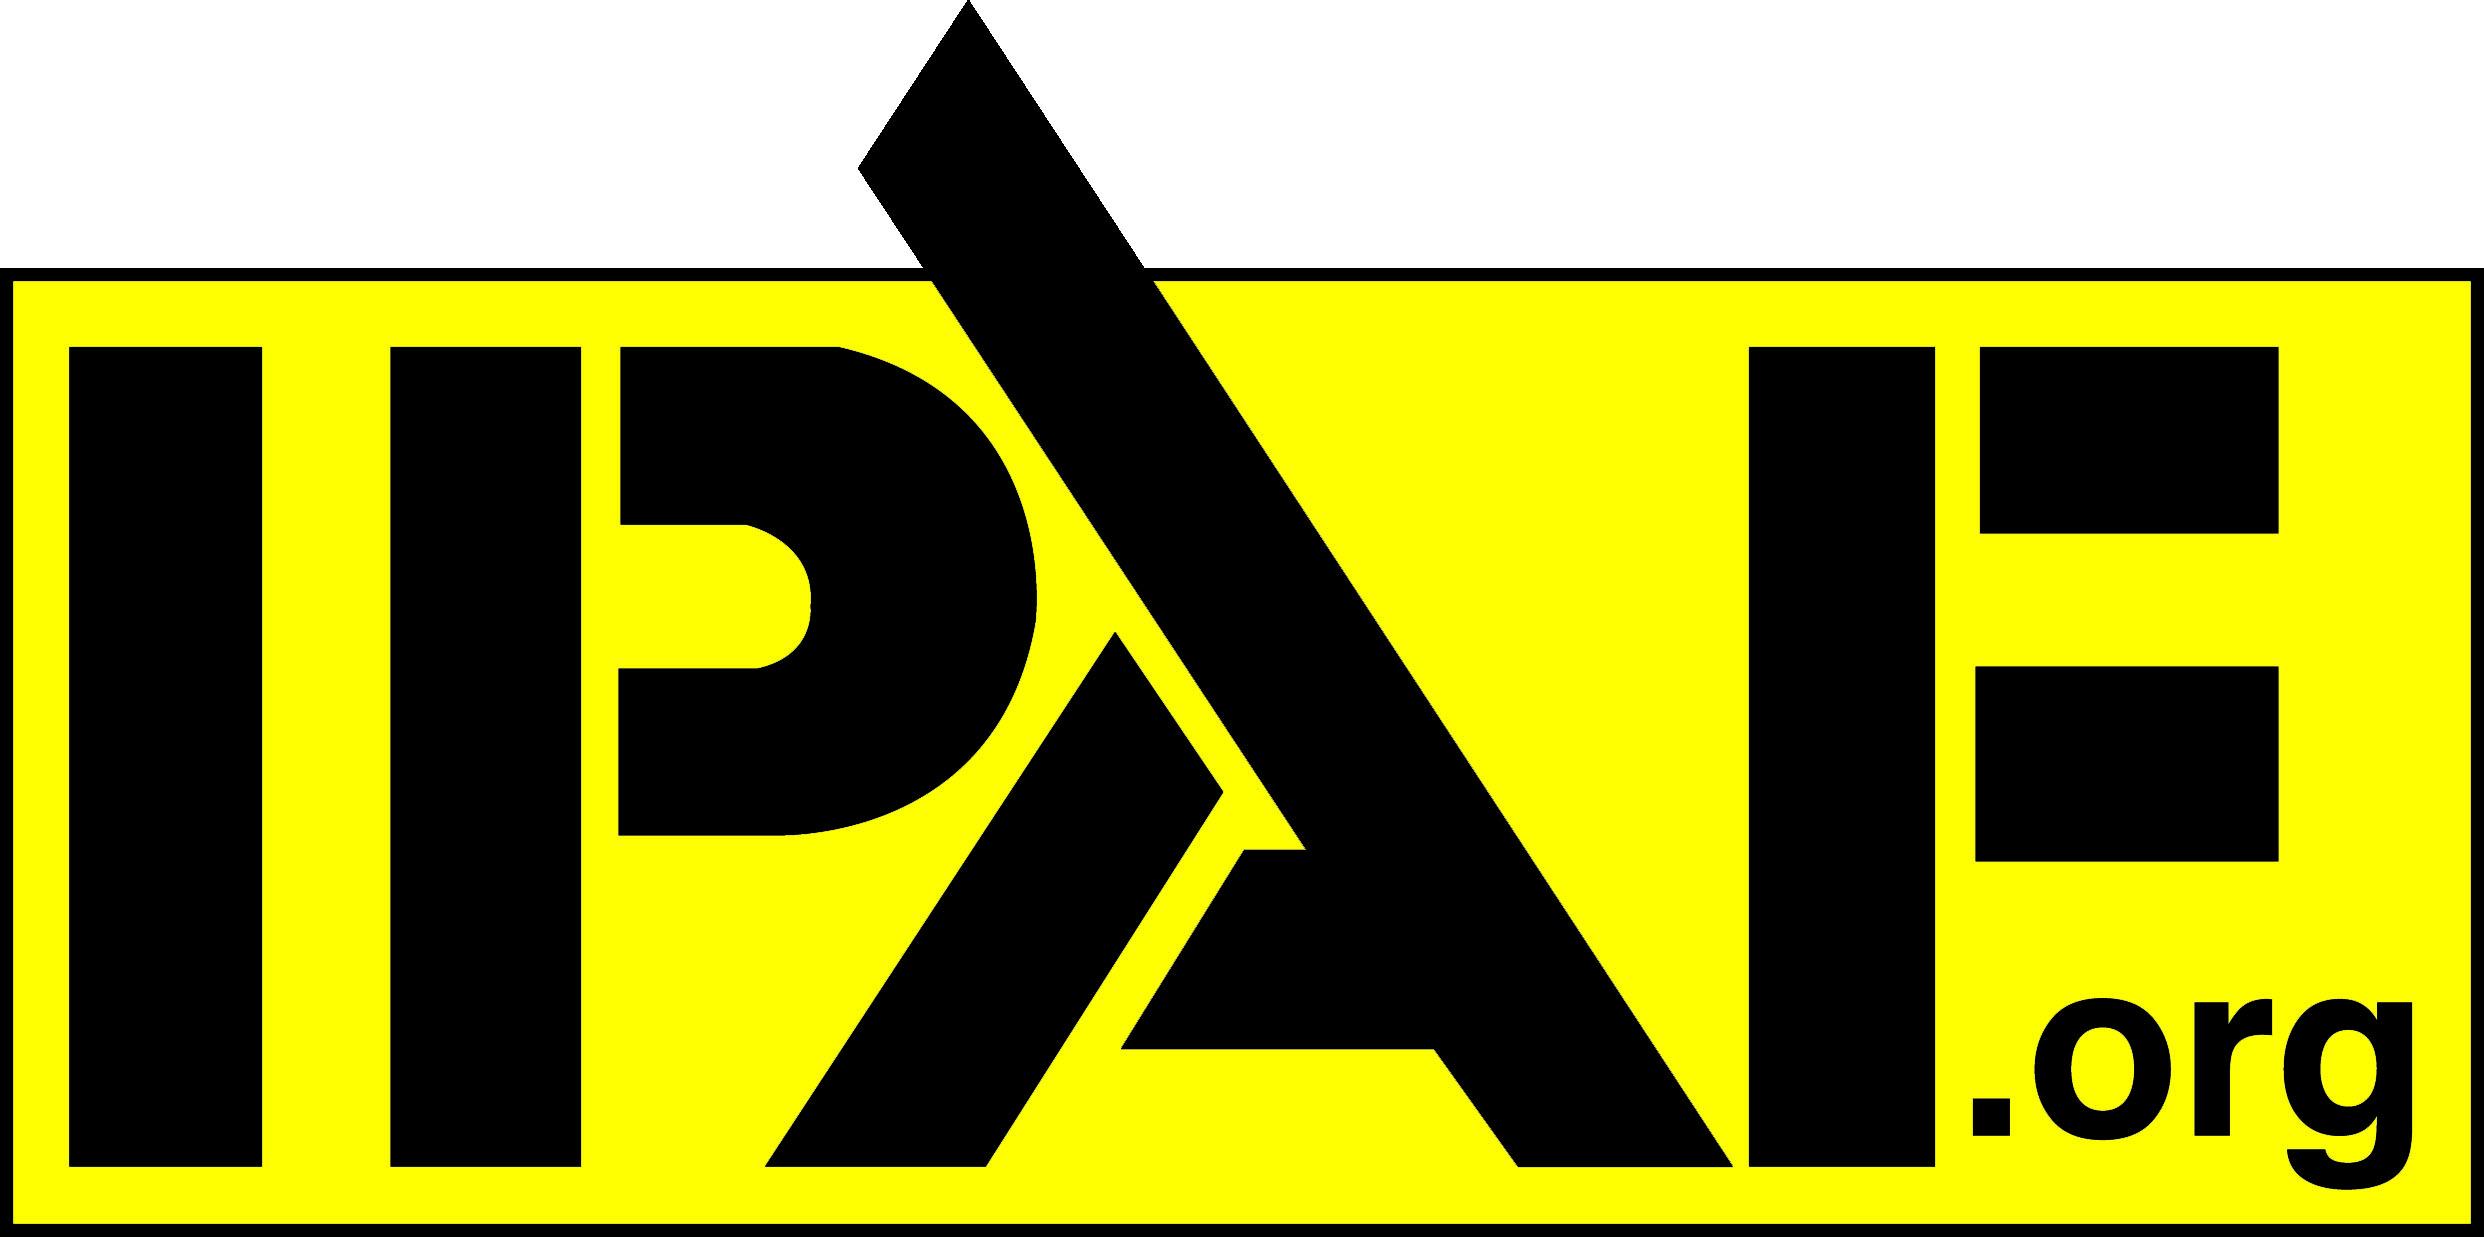 IPAF - International Powered Access Federation